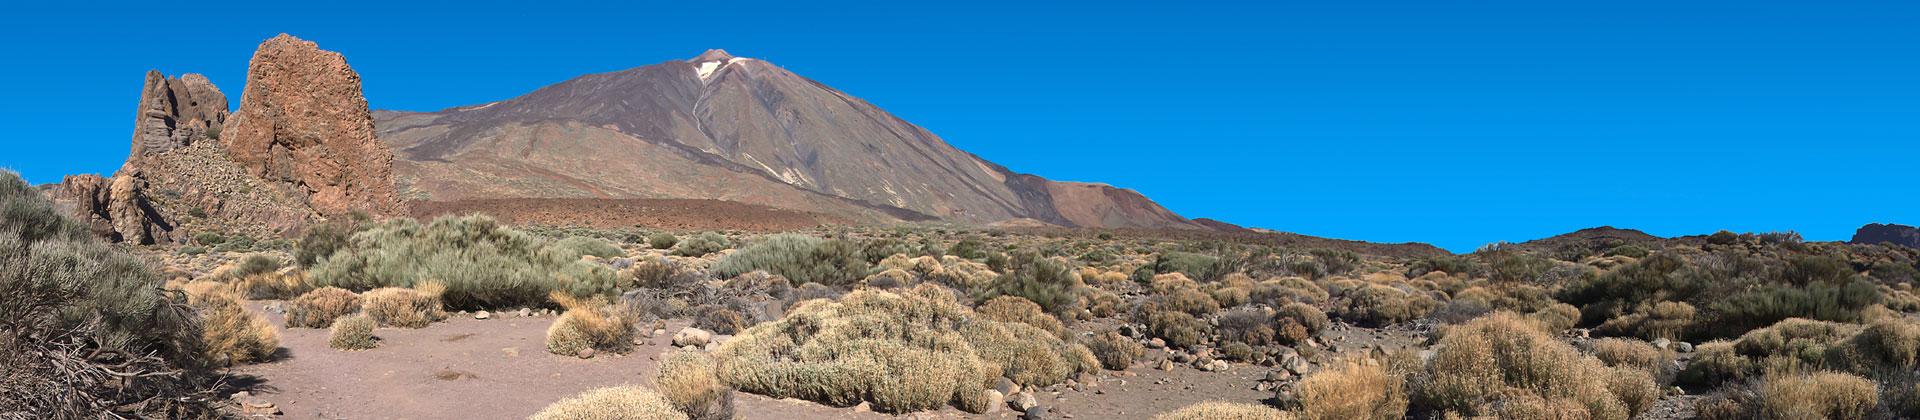 https://www.goodmorningtenerife.com/wp-content/uploads/2014/08/01_slide_teide_GM_Tenerife.jpg